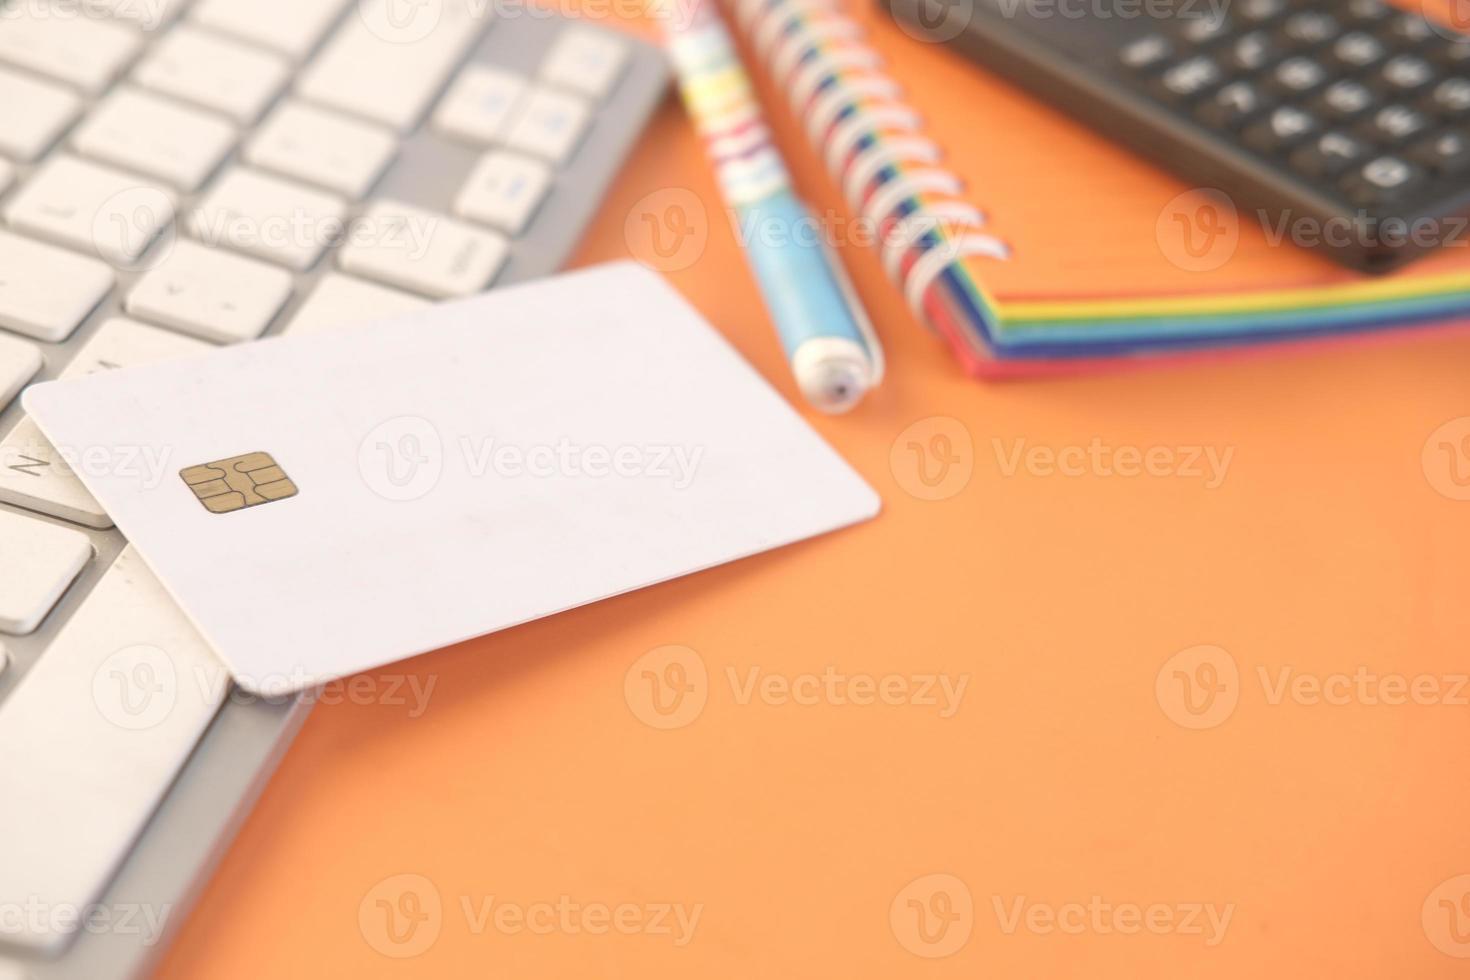 Credit card on orange desk background photo